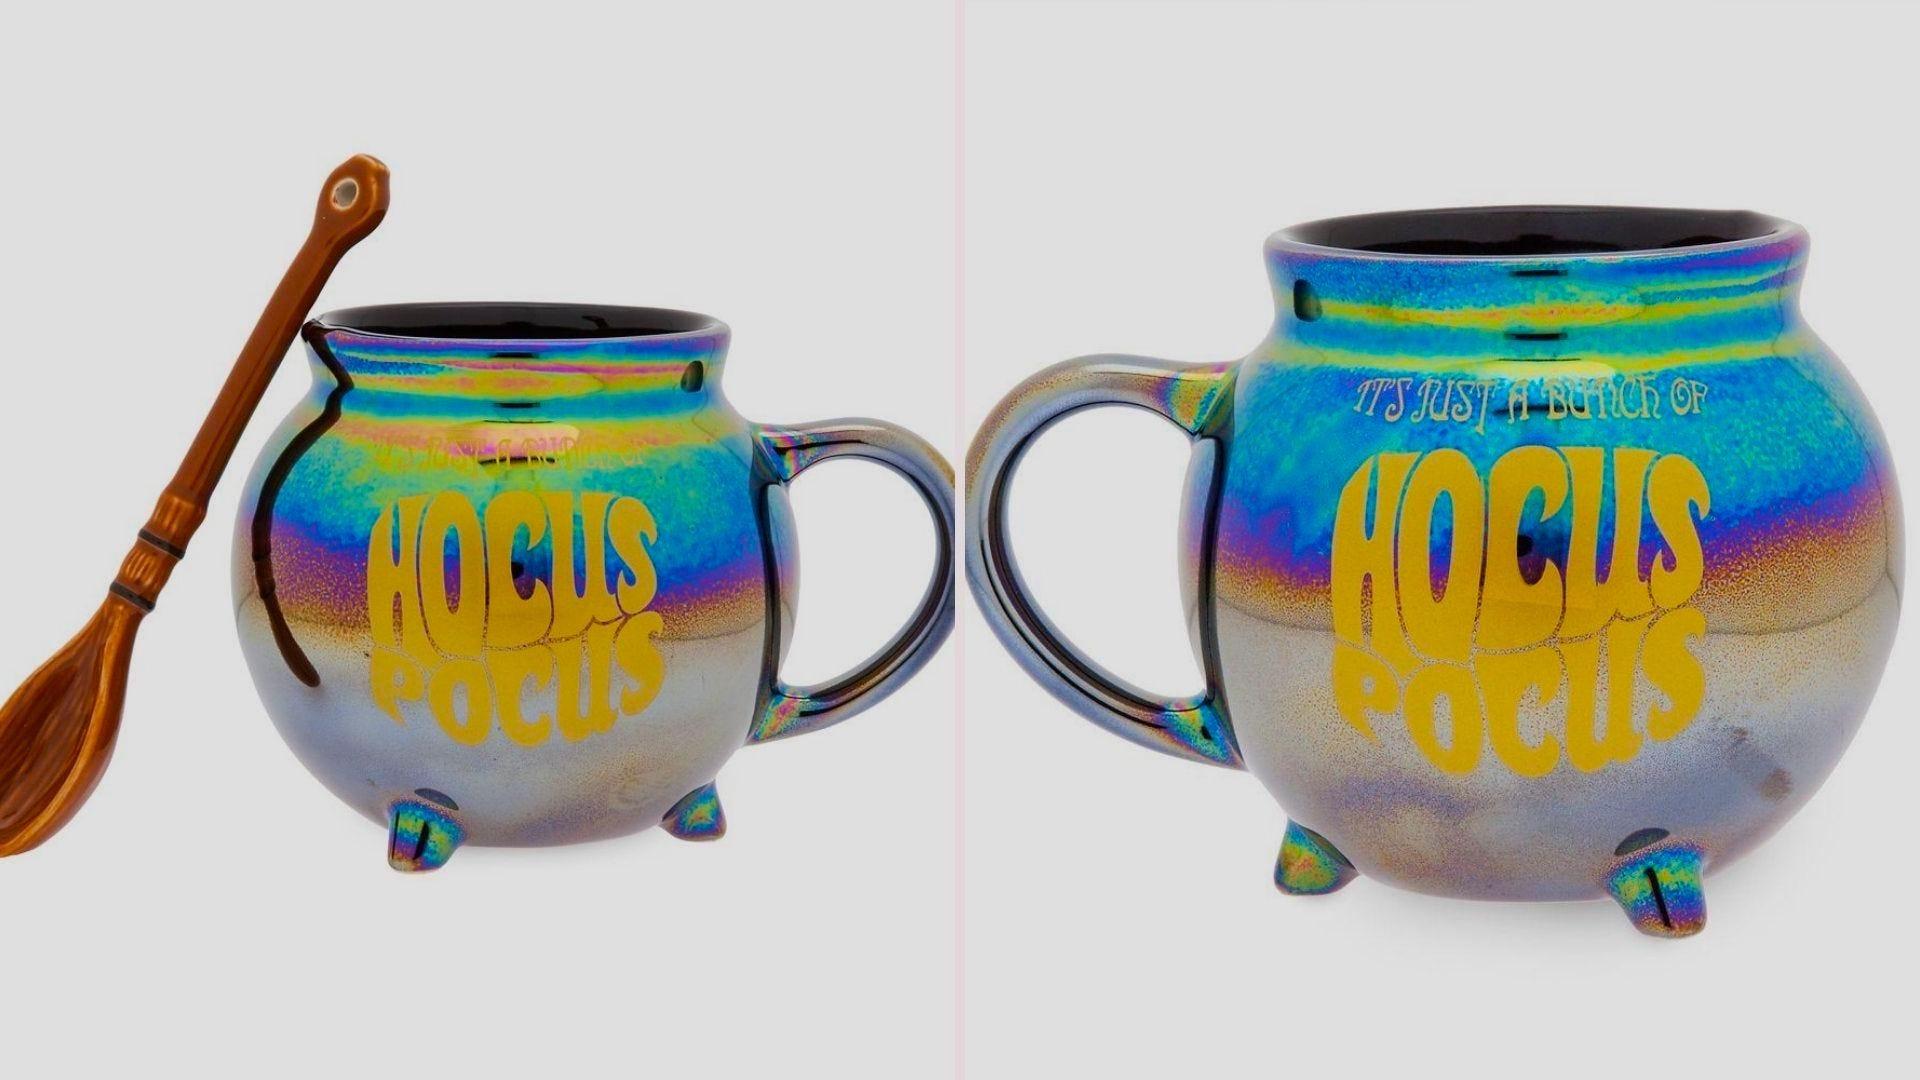 Both sides of an iridescent cauldron-shaped Hocus Pocus coffee mug